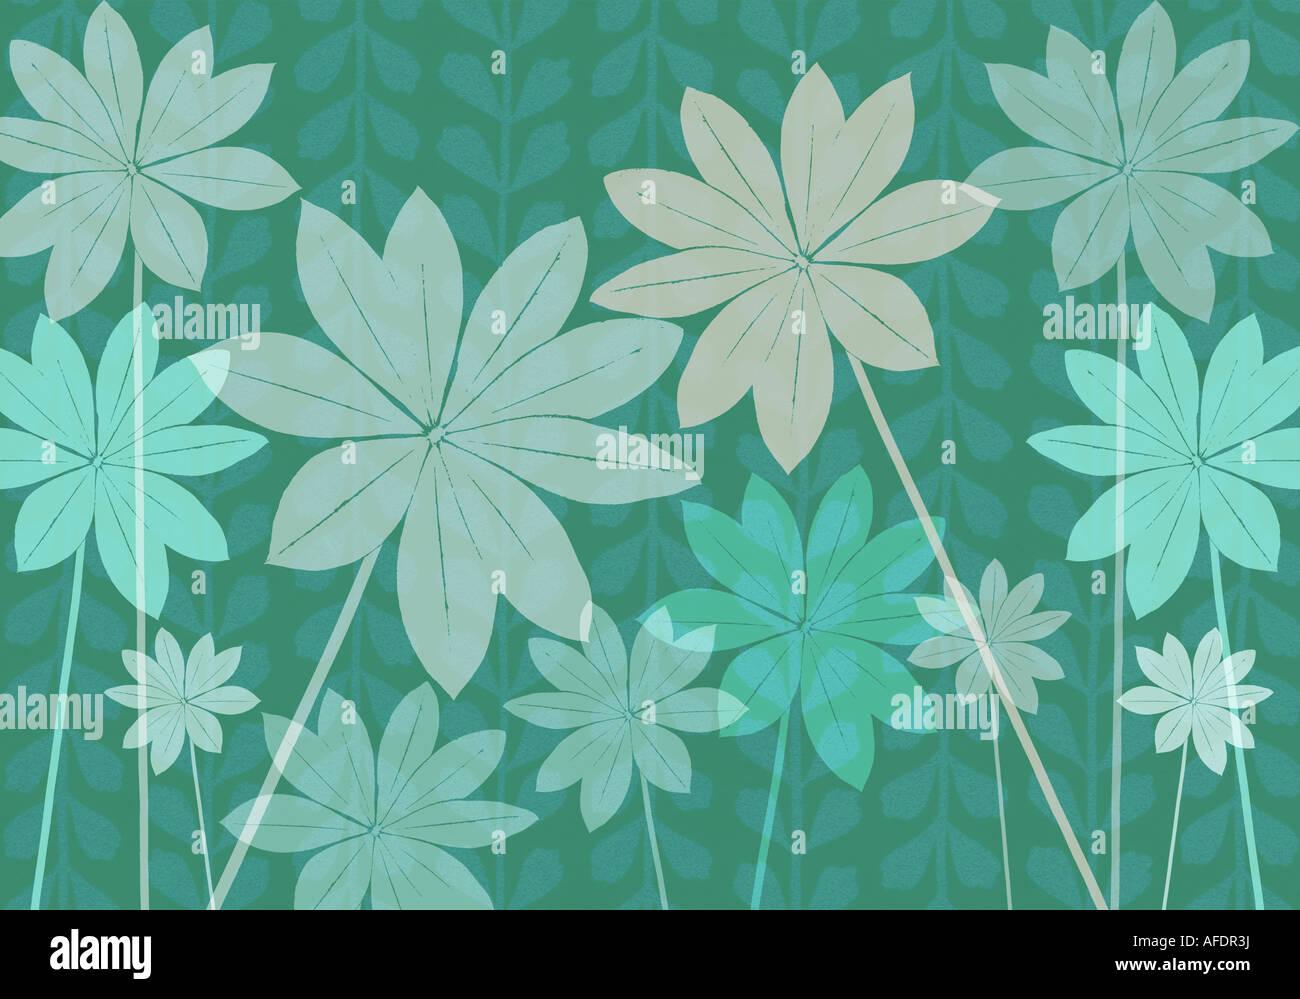 Illustration of lupin foliage Stock Photo